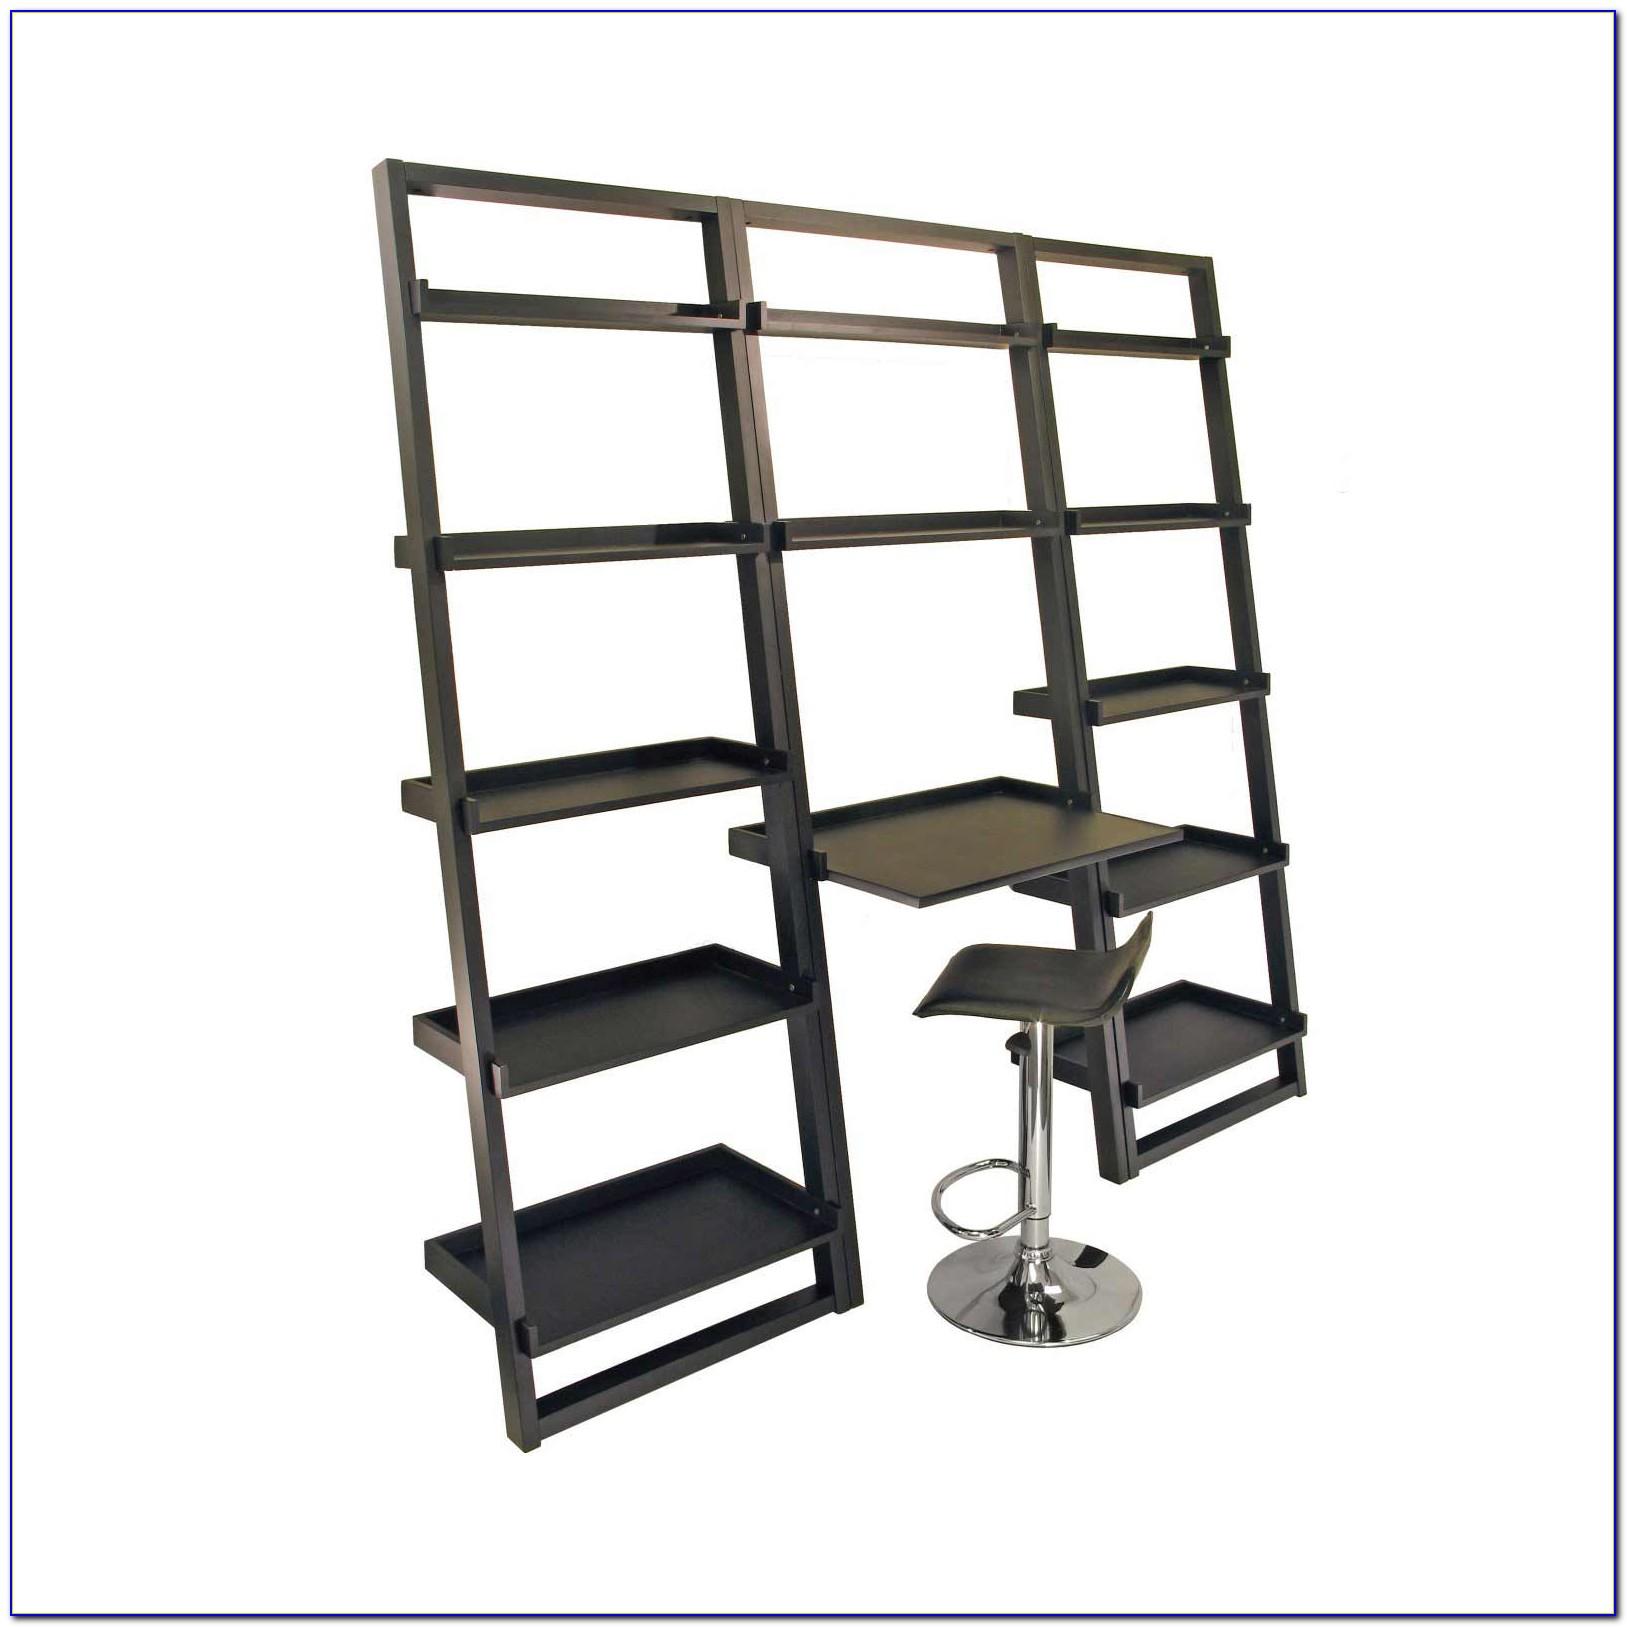 Leaning Ladder Shelf With Desk